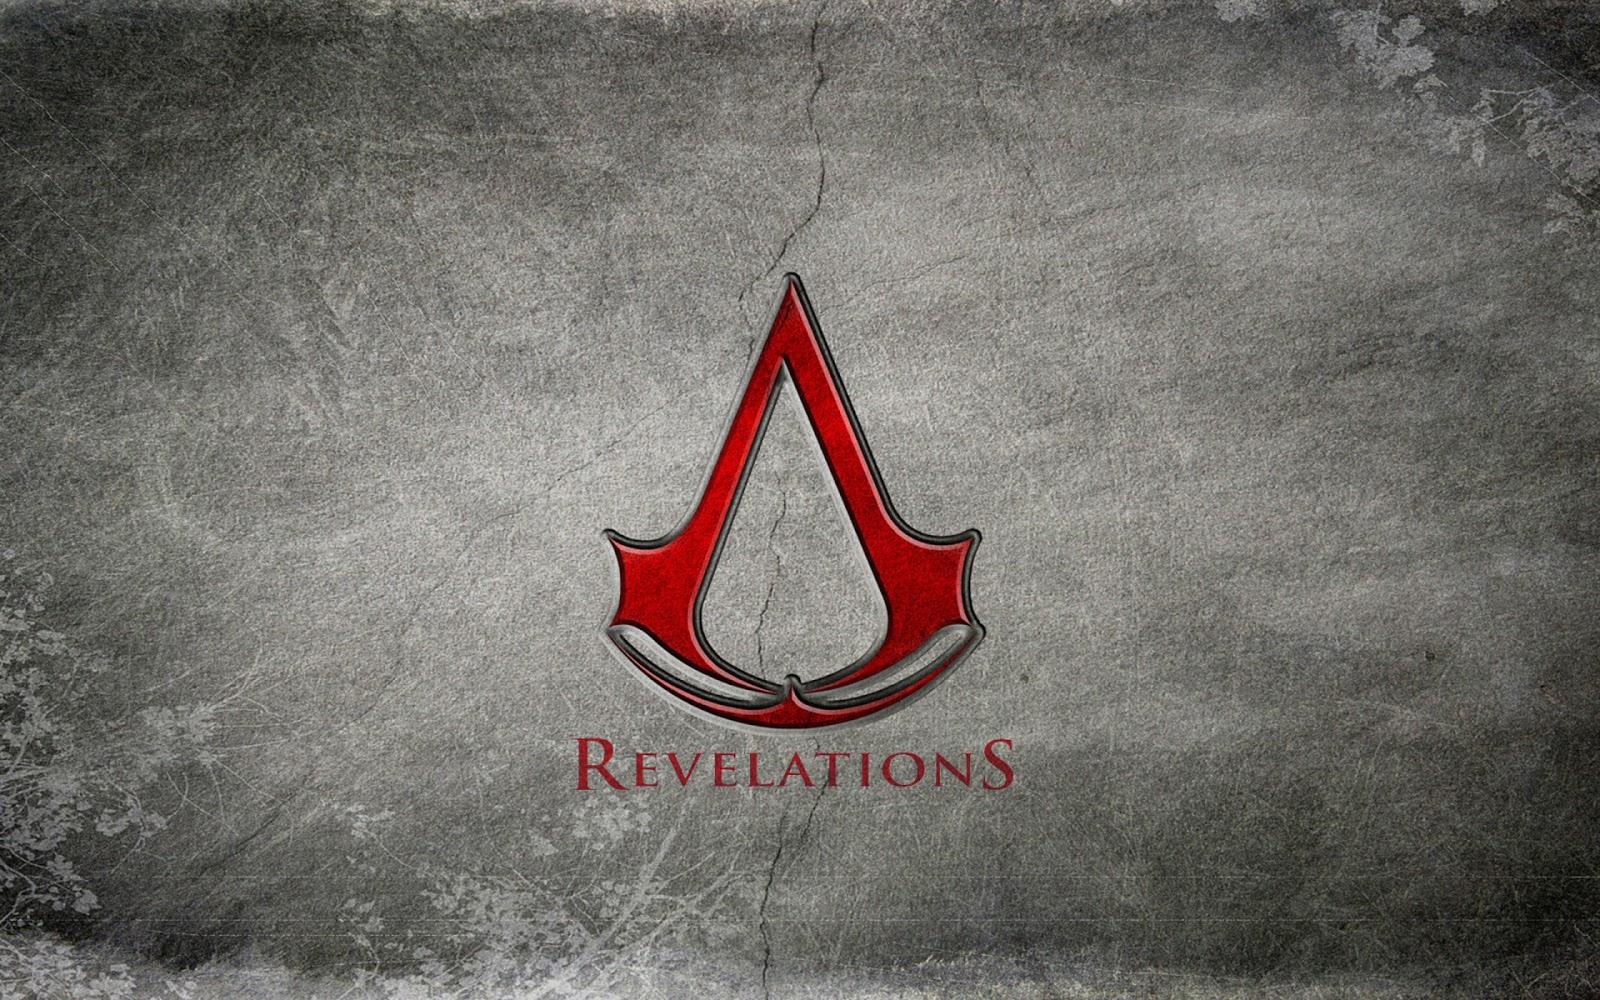 wallpapers hd for mac assassins creed revelations simbol